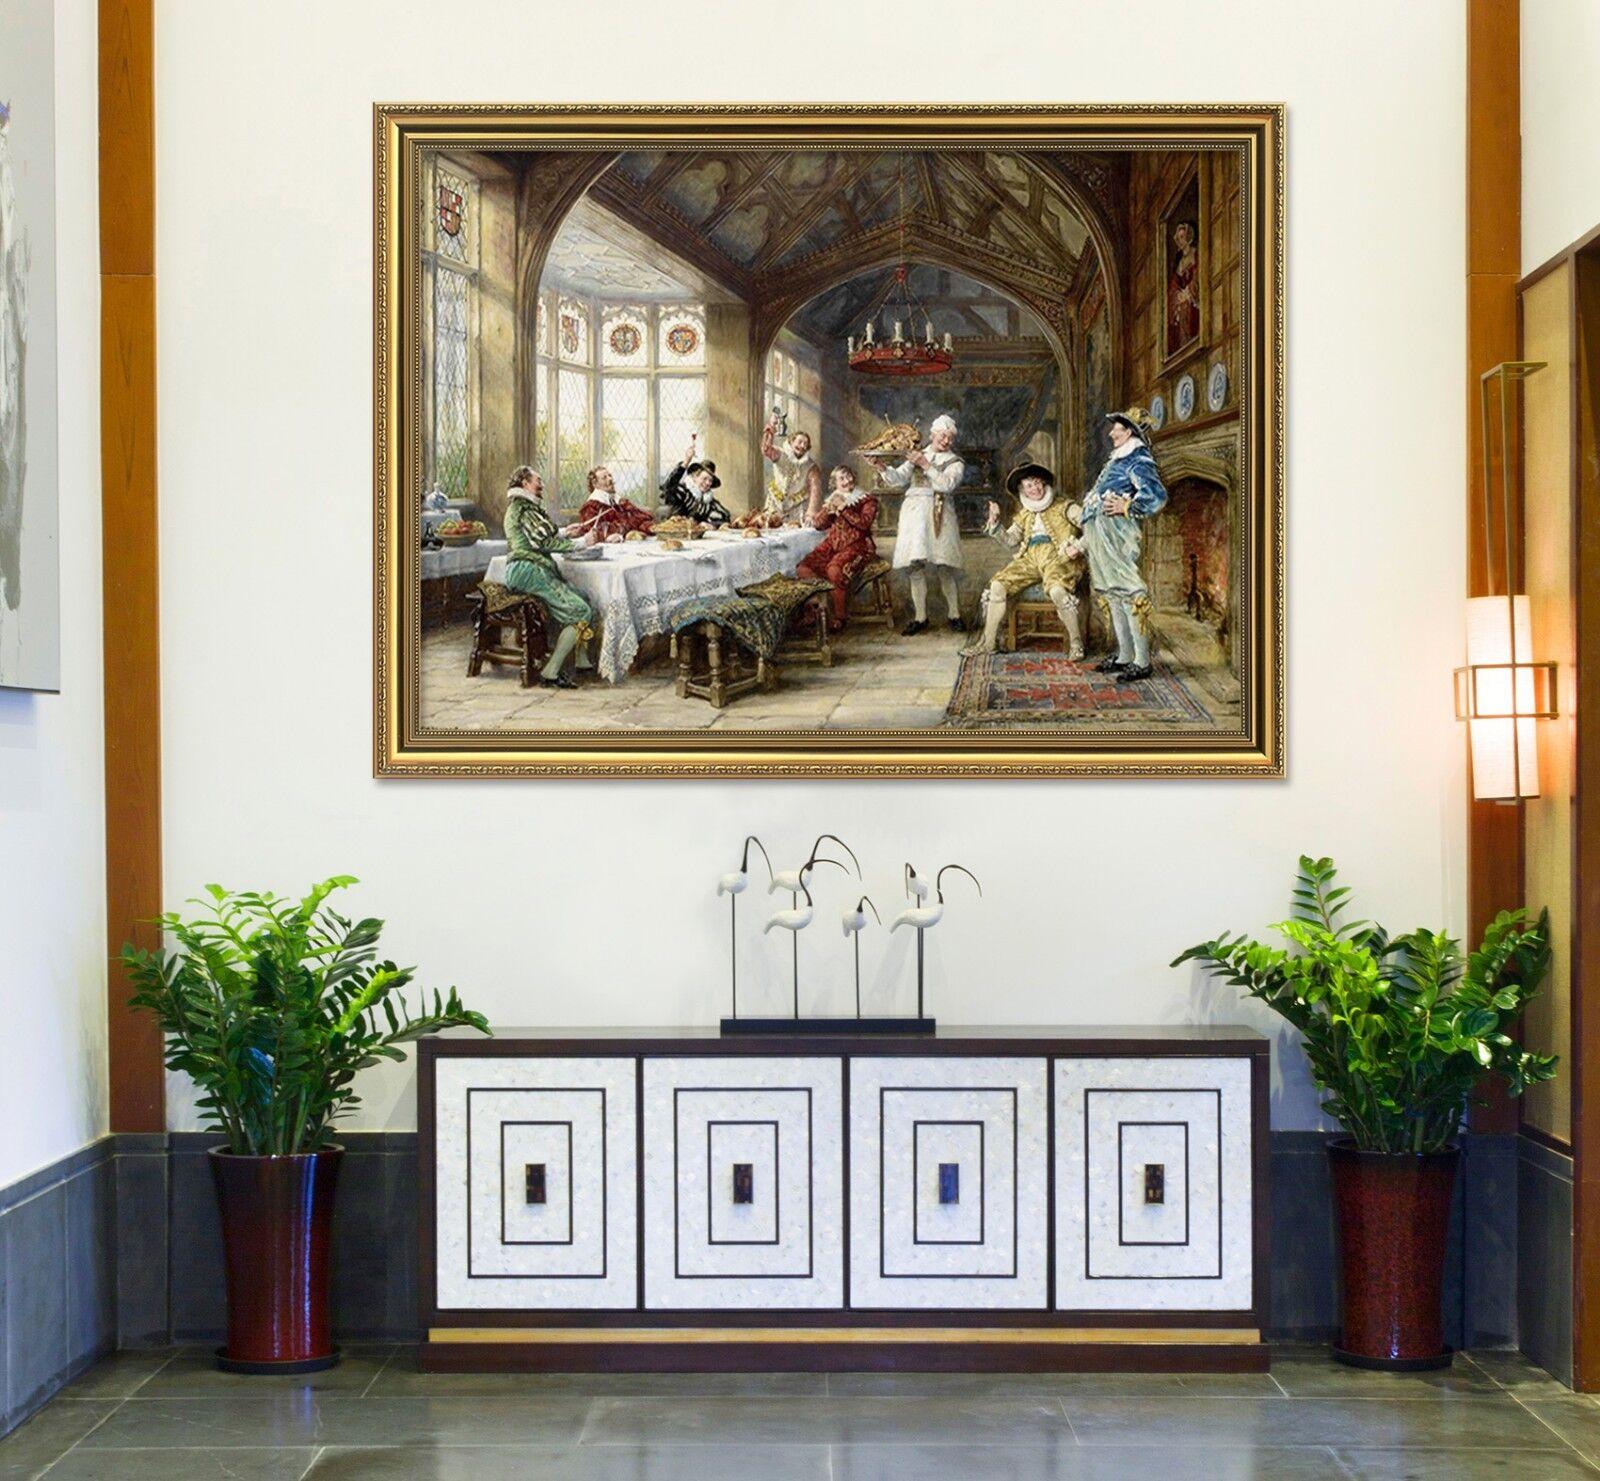 3D cena de hombre 67 Póster Enmarcado Decoración del Hogar Pintura de Impresión Arte AJ Wallpaper